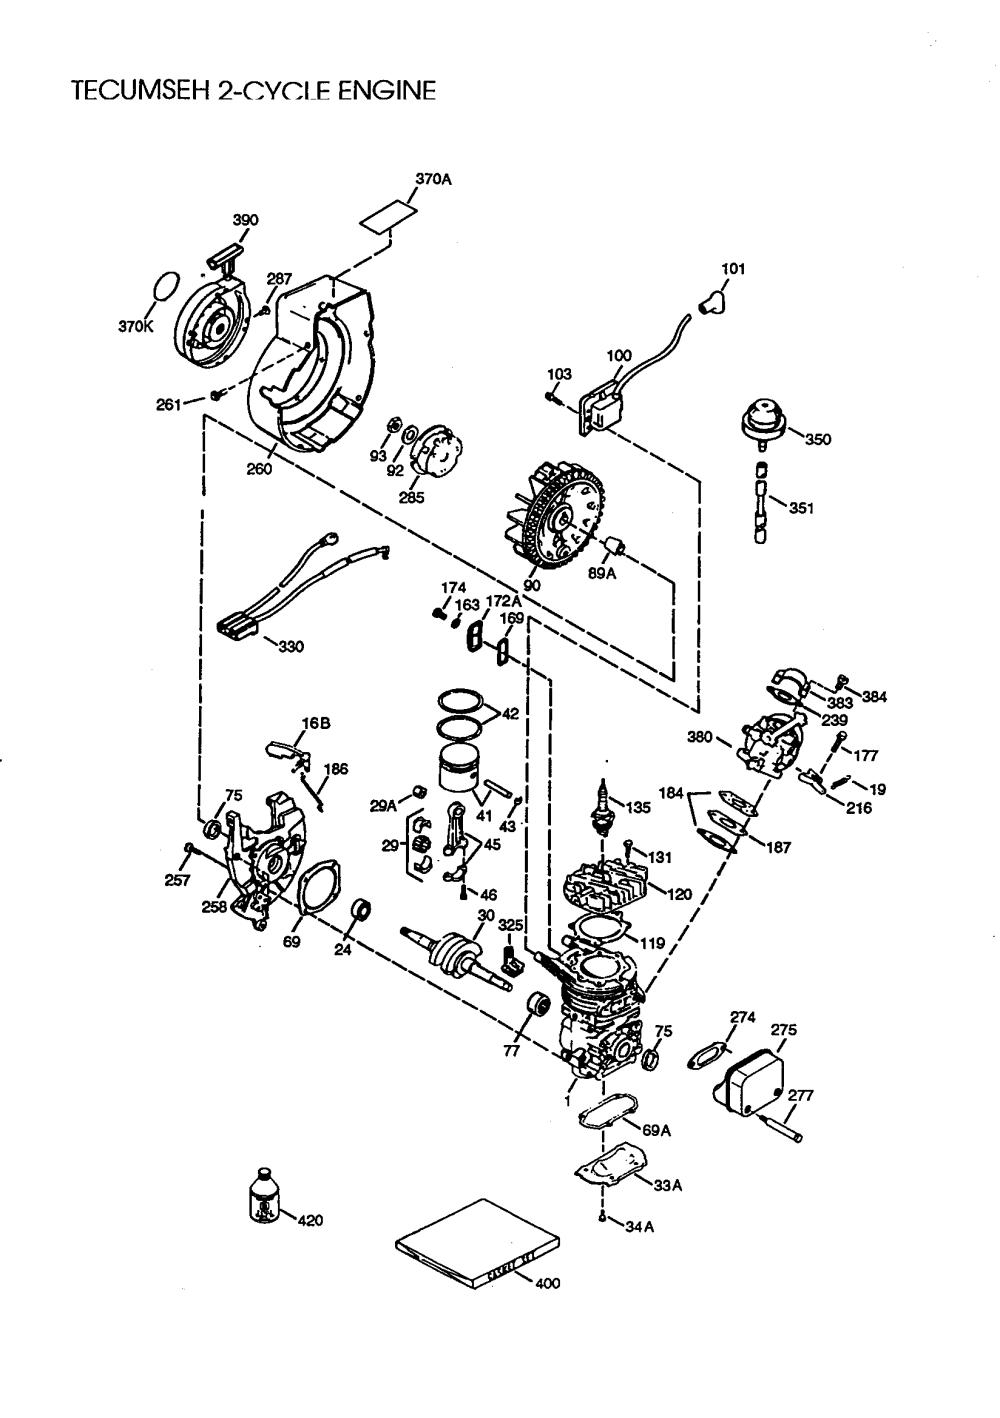 medium resolution of tecumseh hsk600 1704t techumseh 2 cycle engine diagram